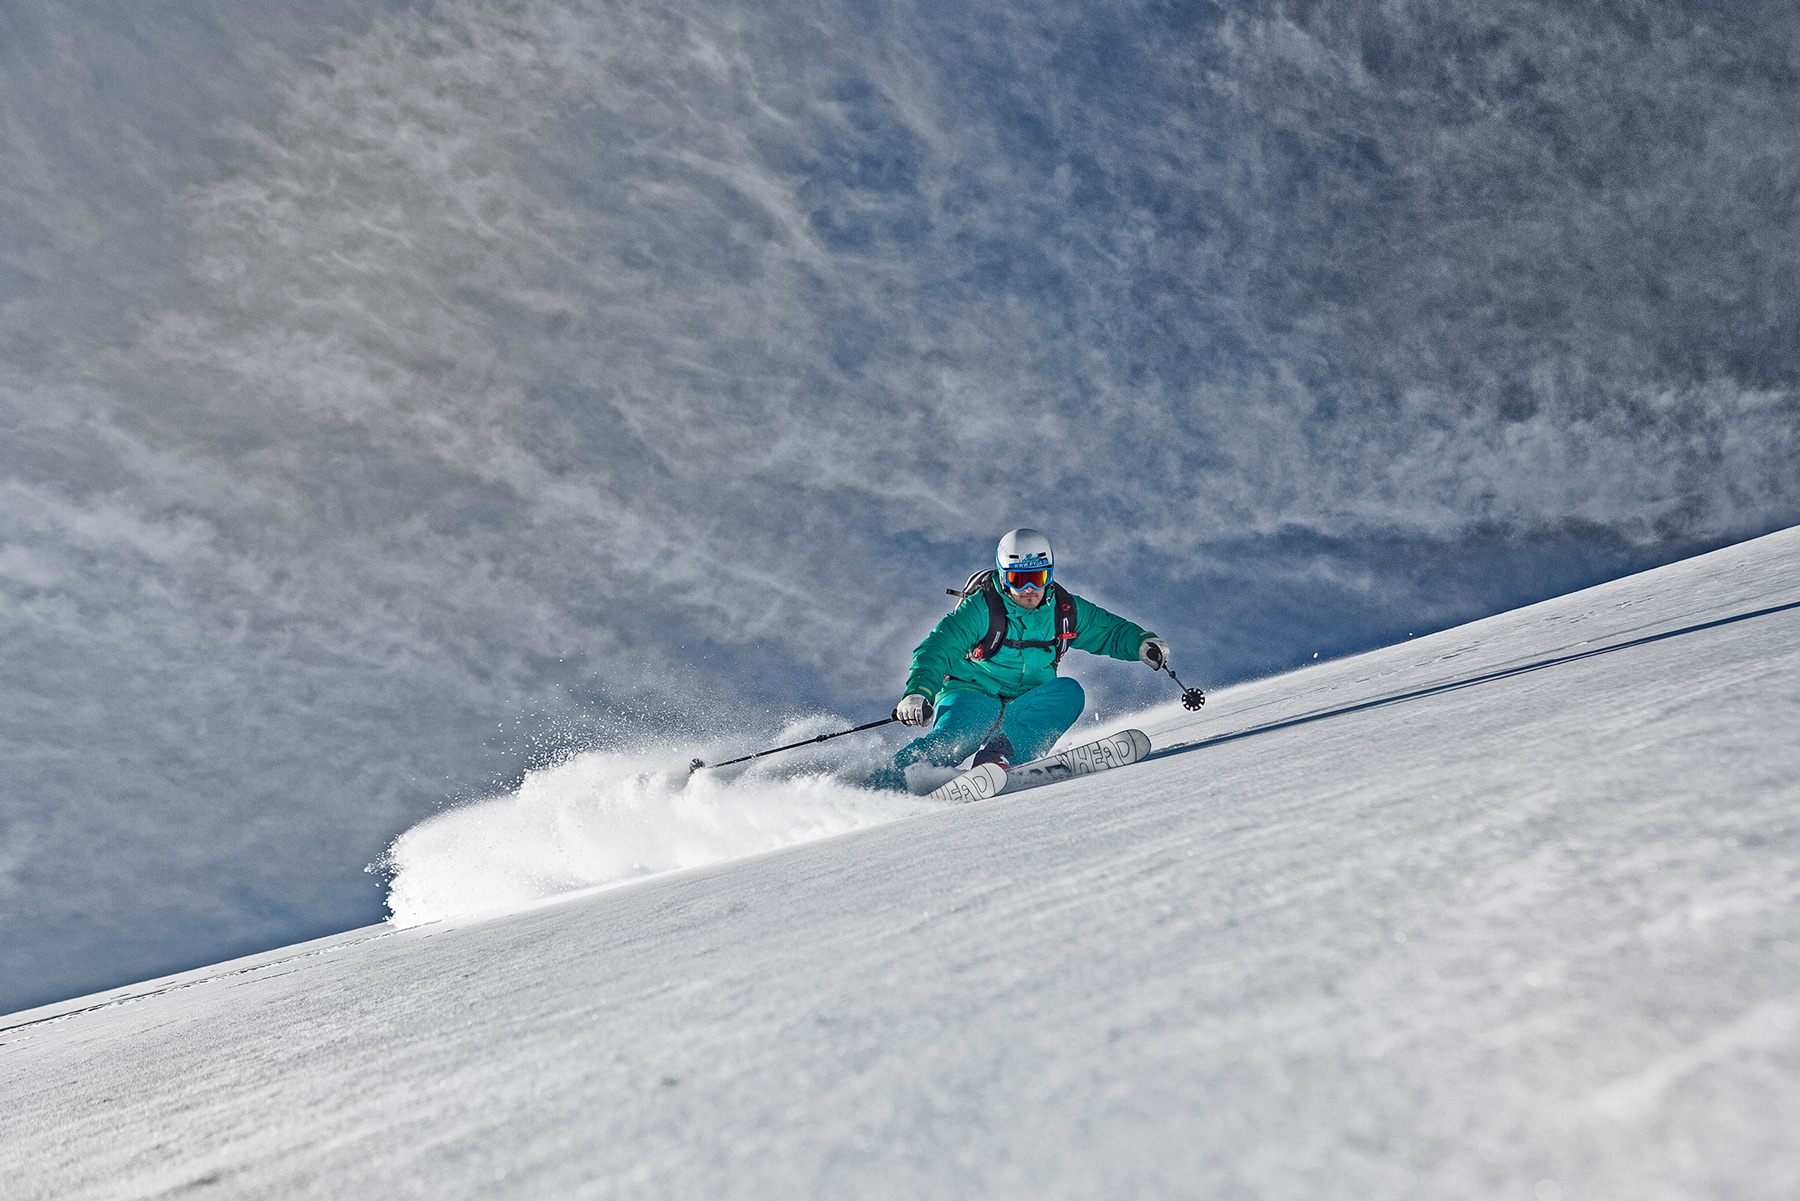 14-Pyua-Dachstein-Ski-Action-Christoph-Gramann